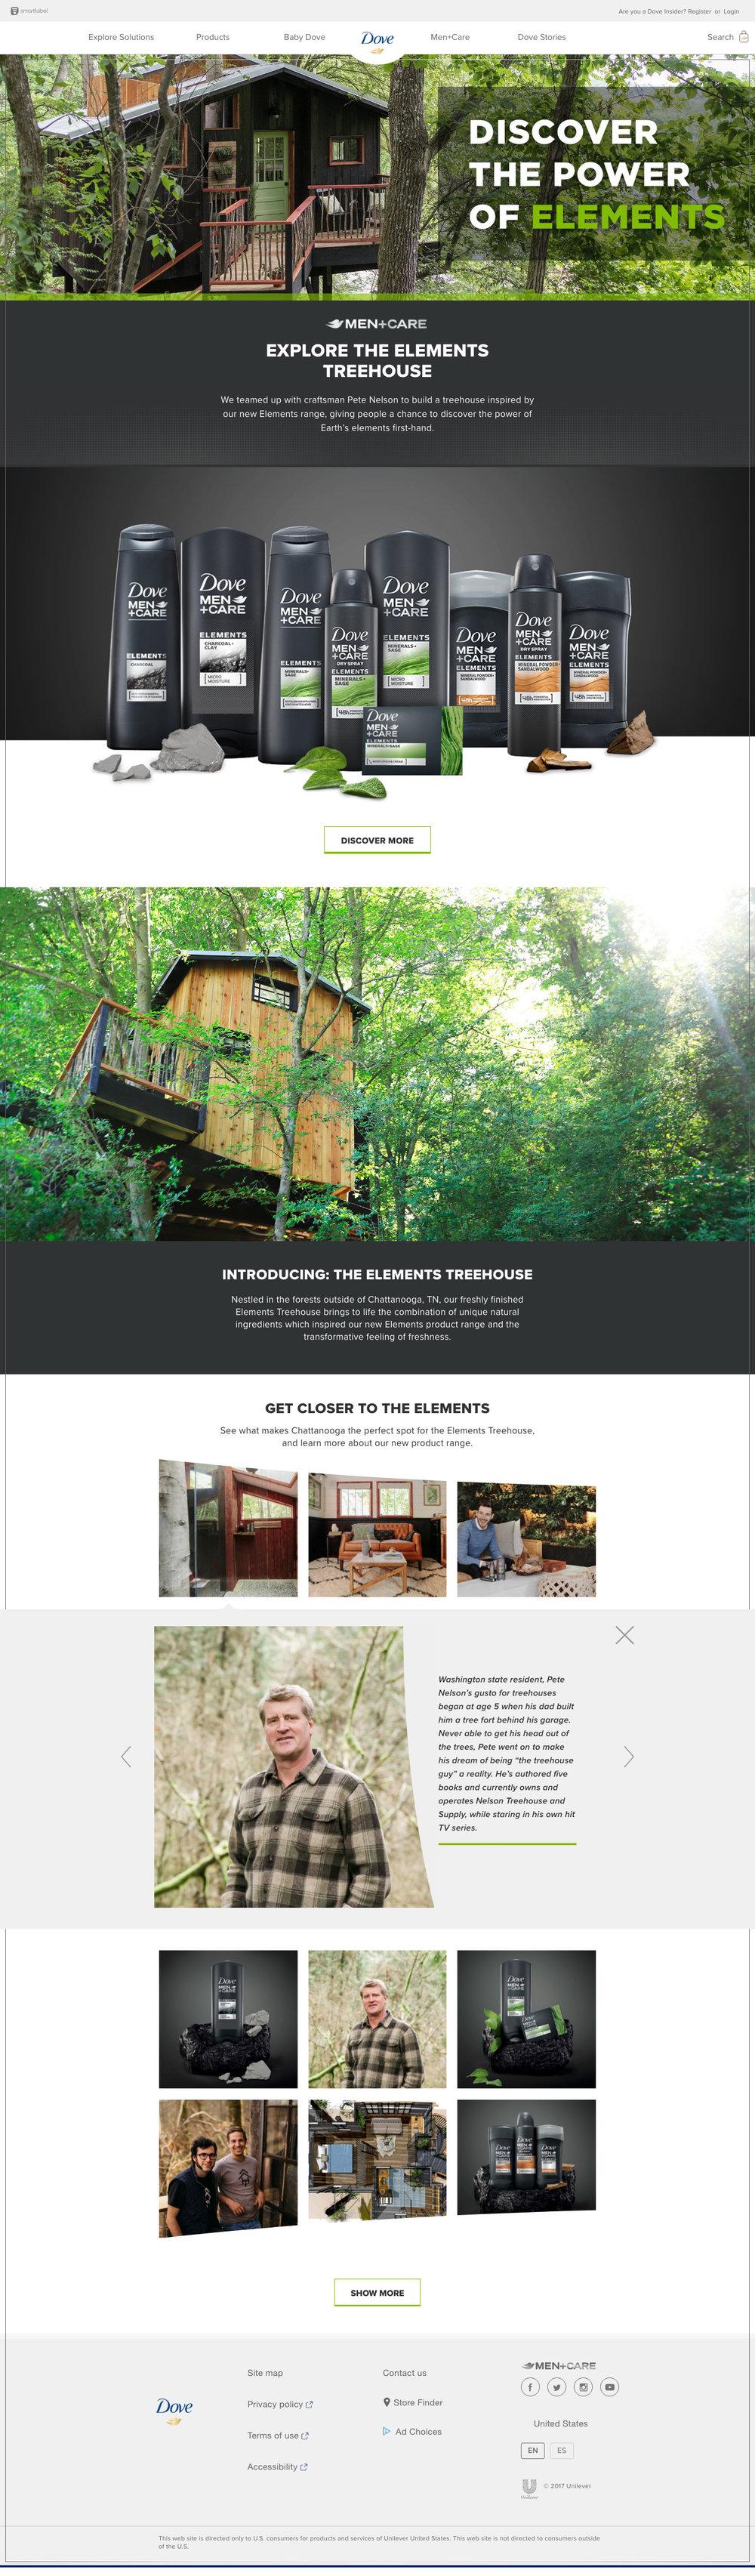 treehouse-psdg.jpg